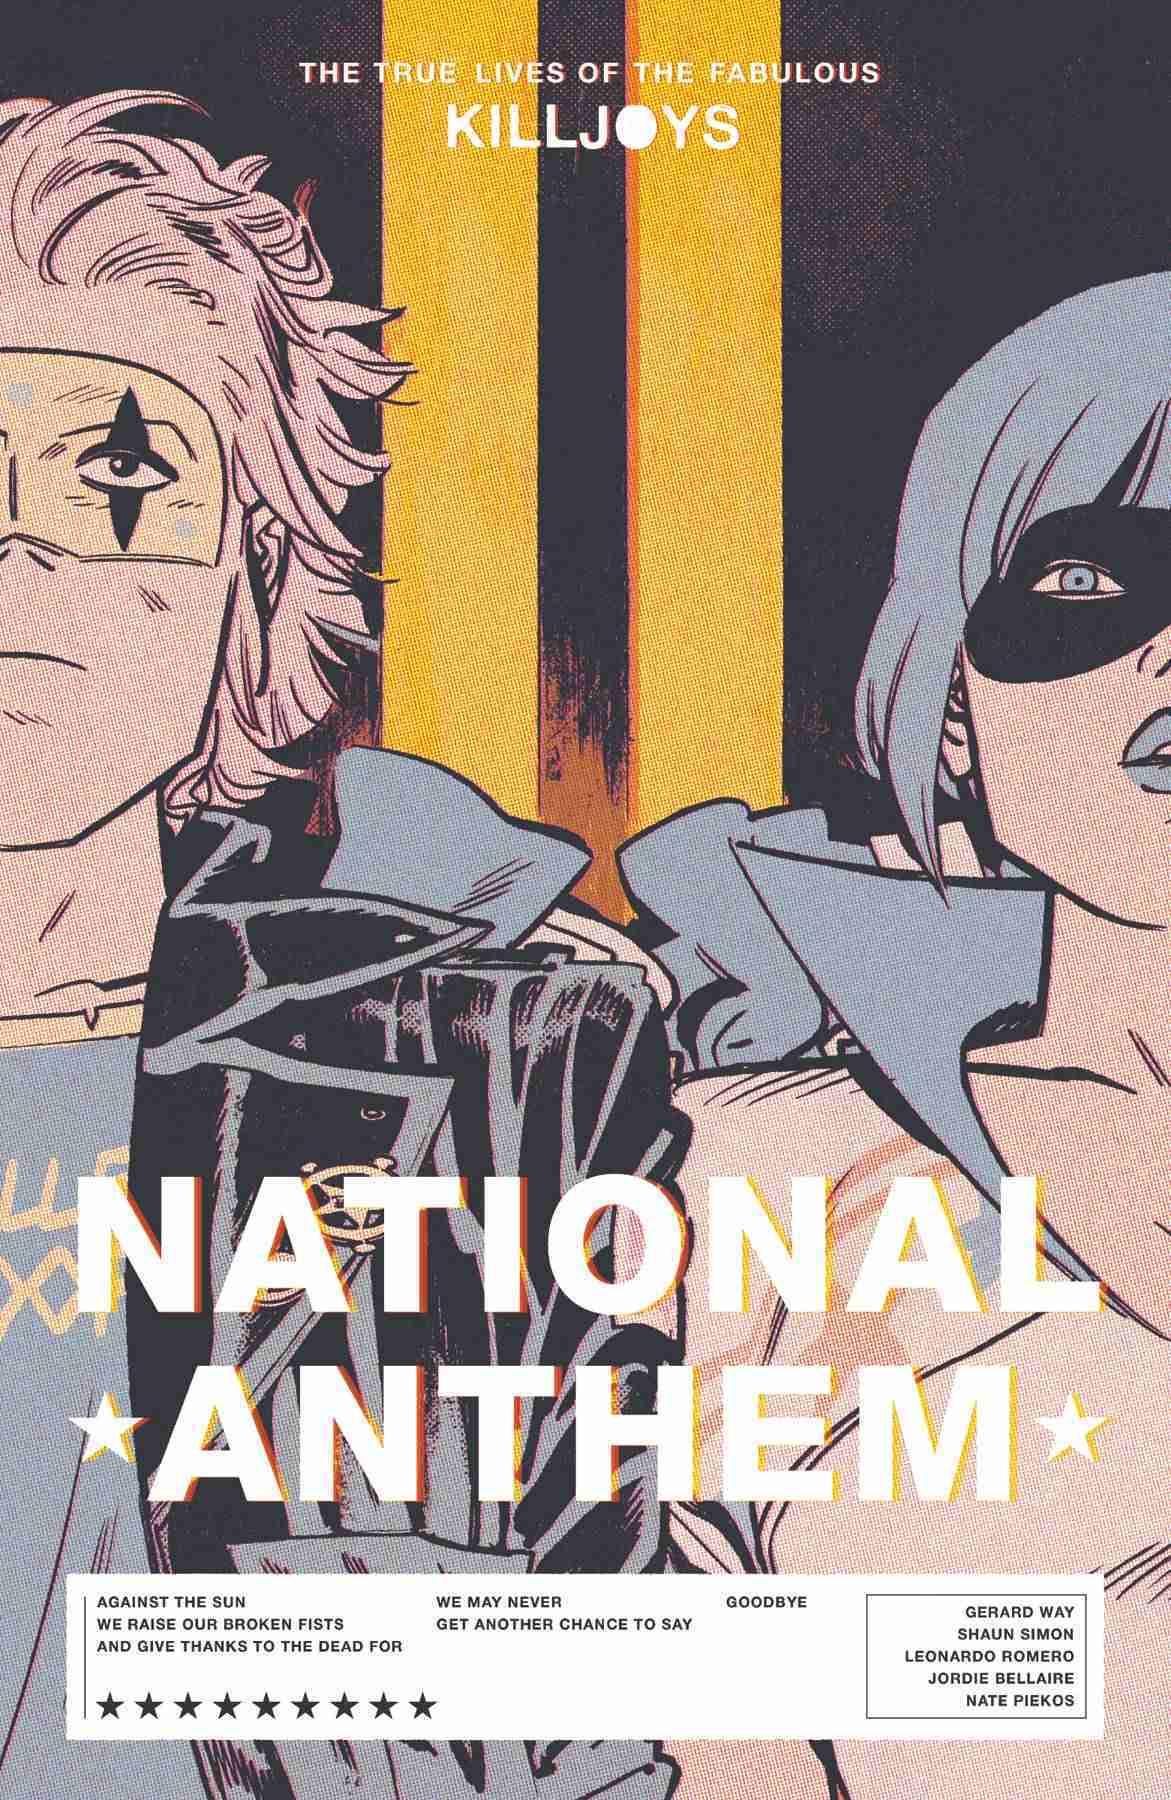 True Lives of the Fabulous Killjoys National Anthem